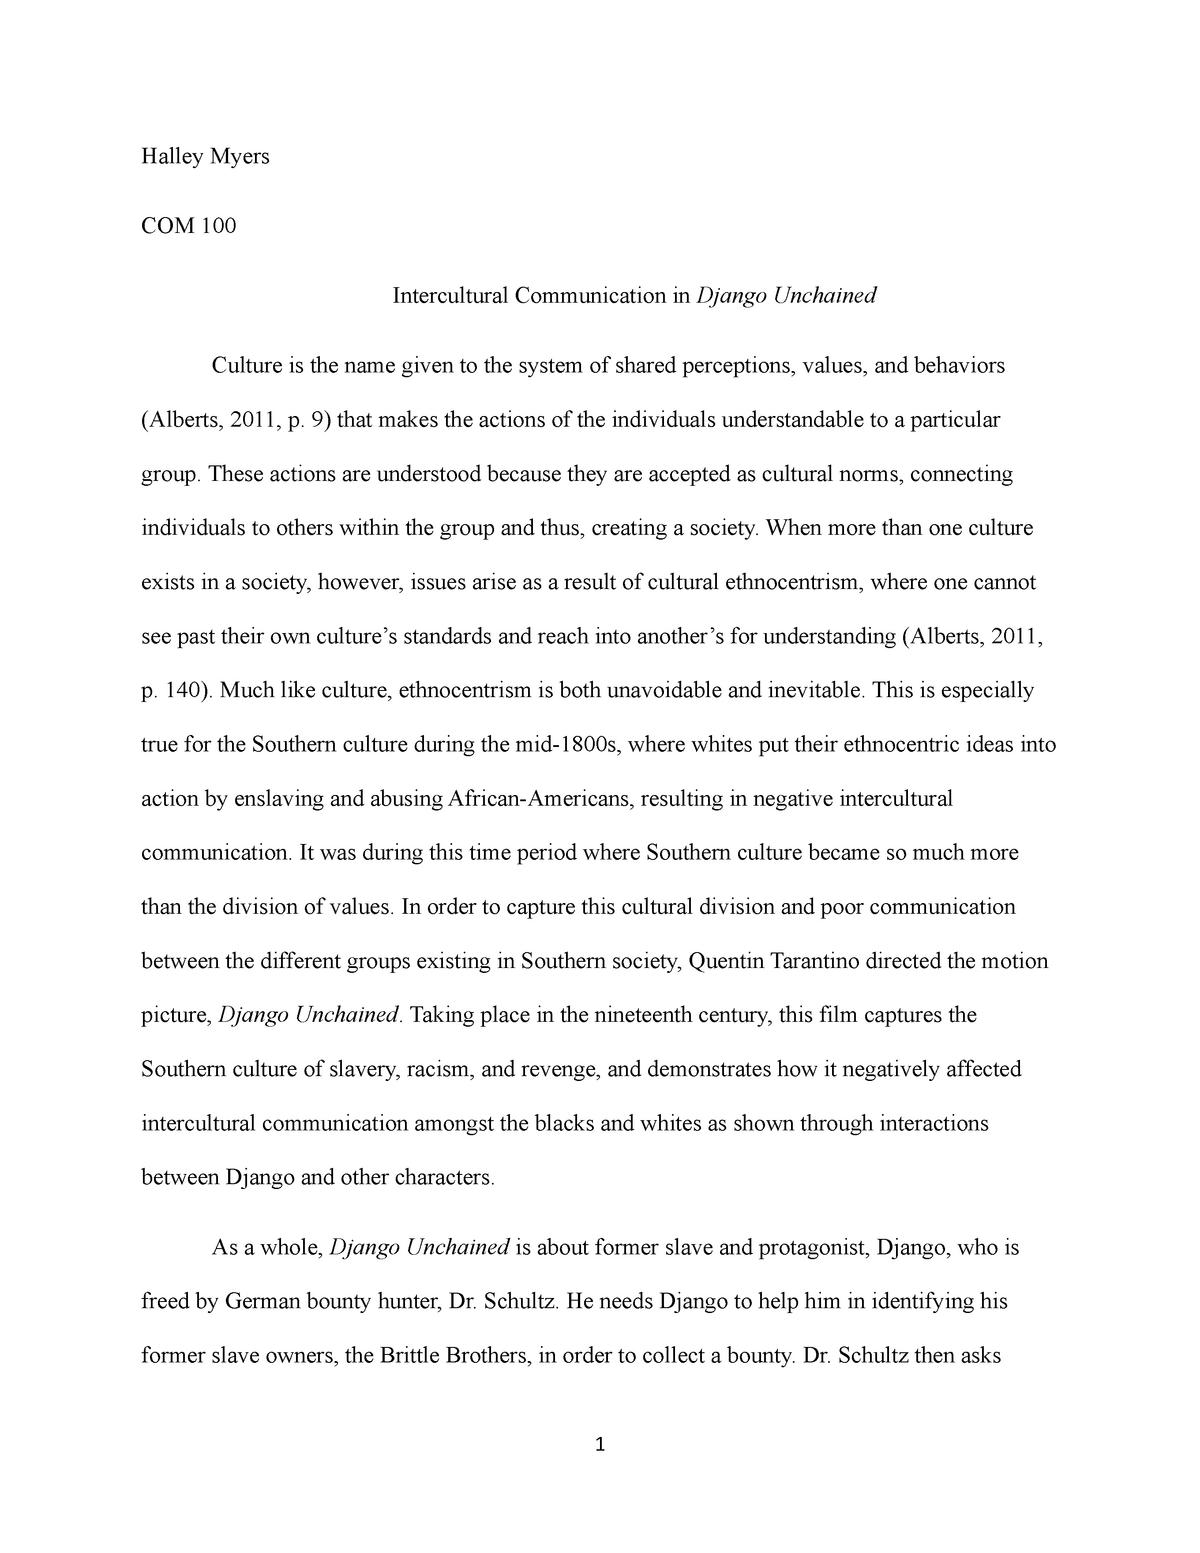 Communication essay ghostwriting sites prek teacher resume